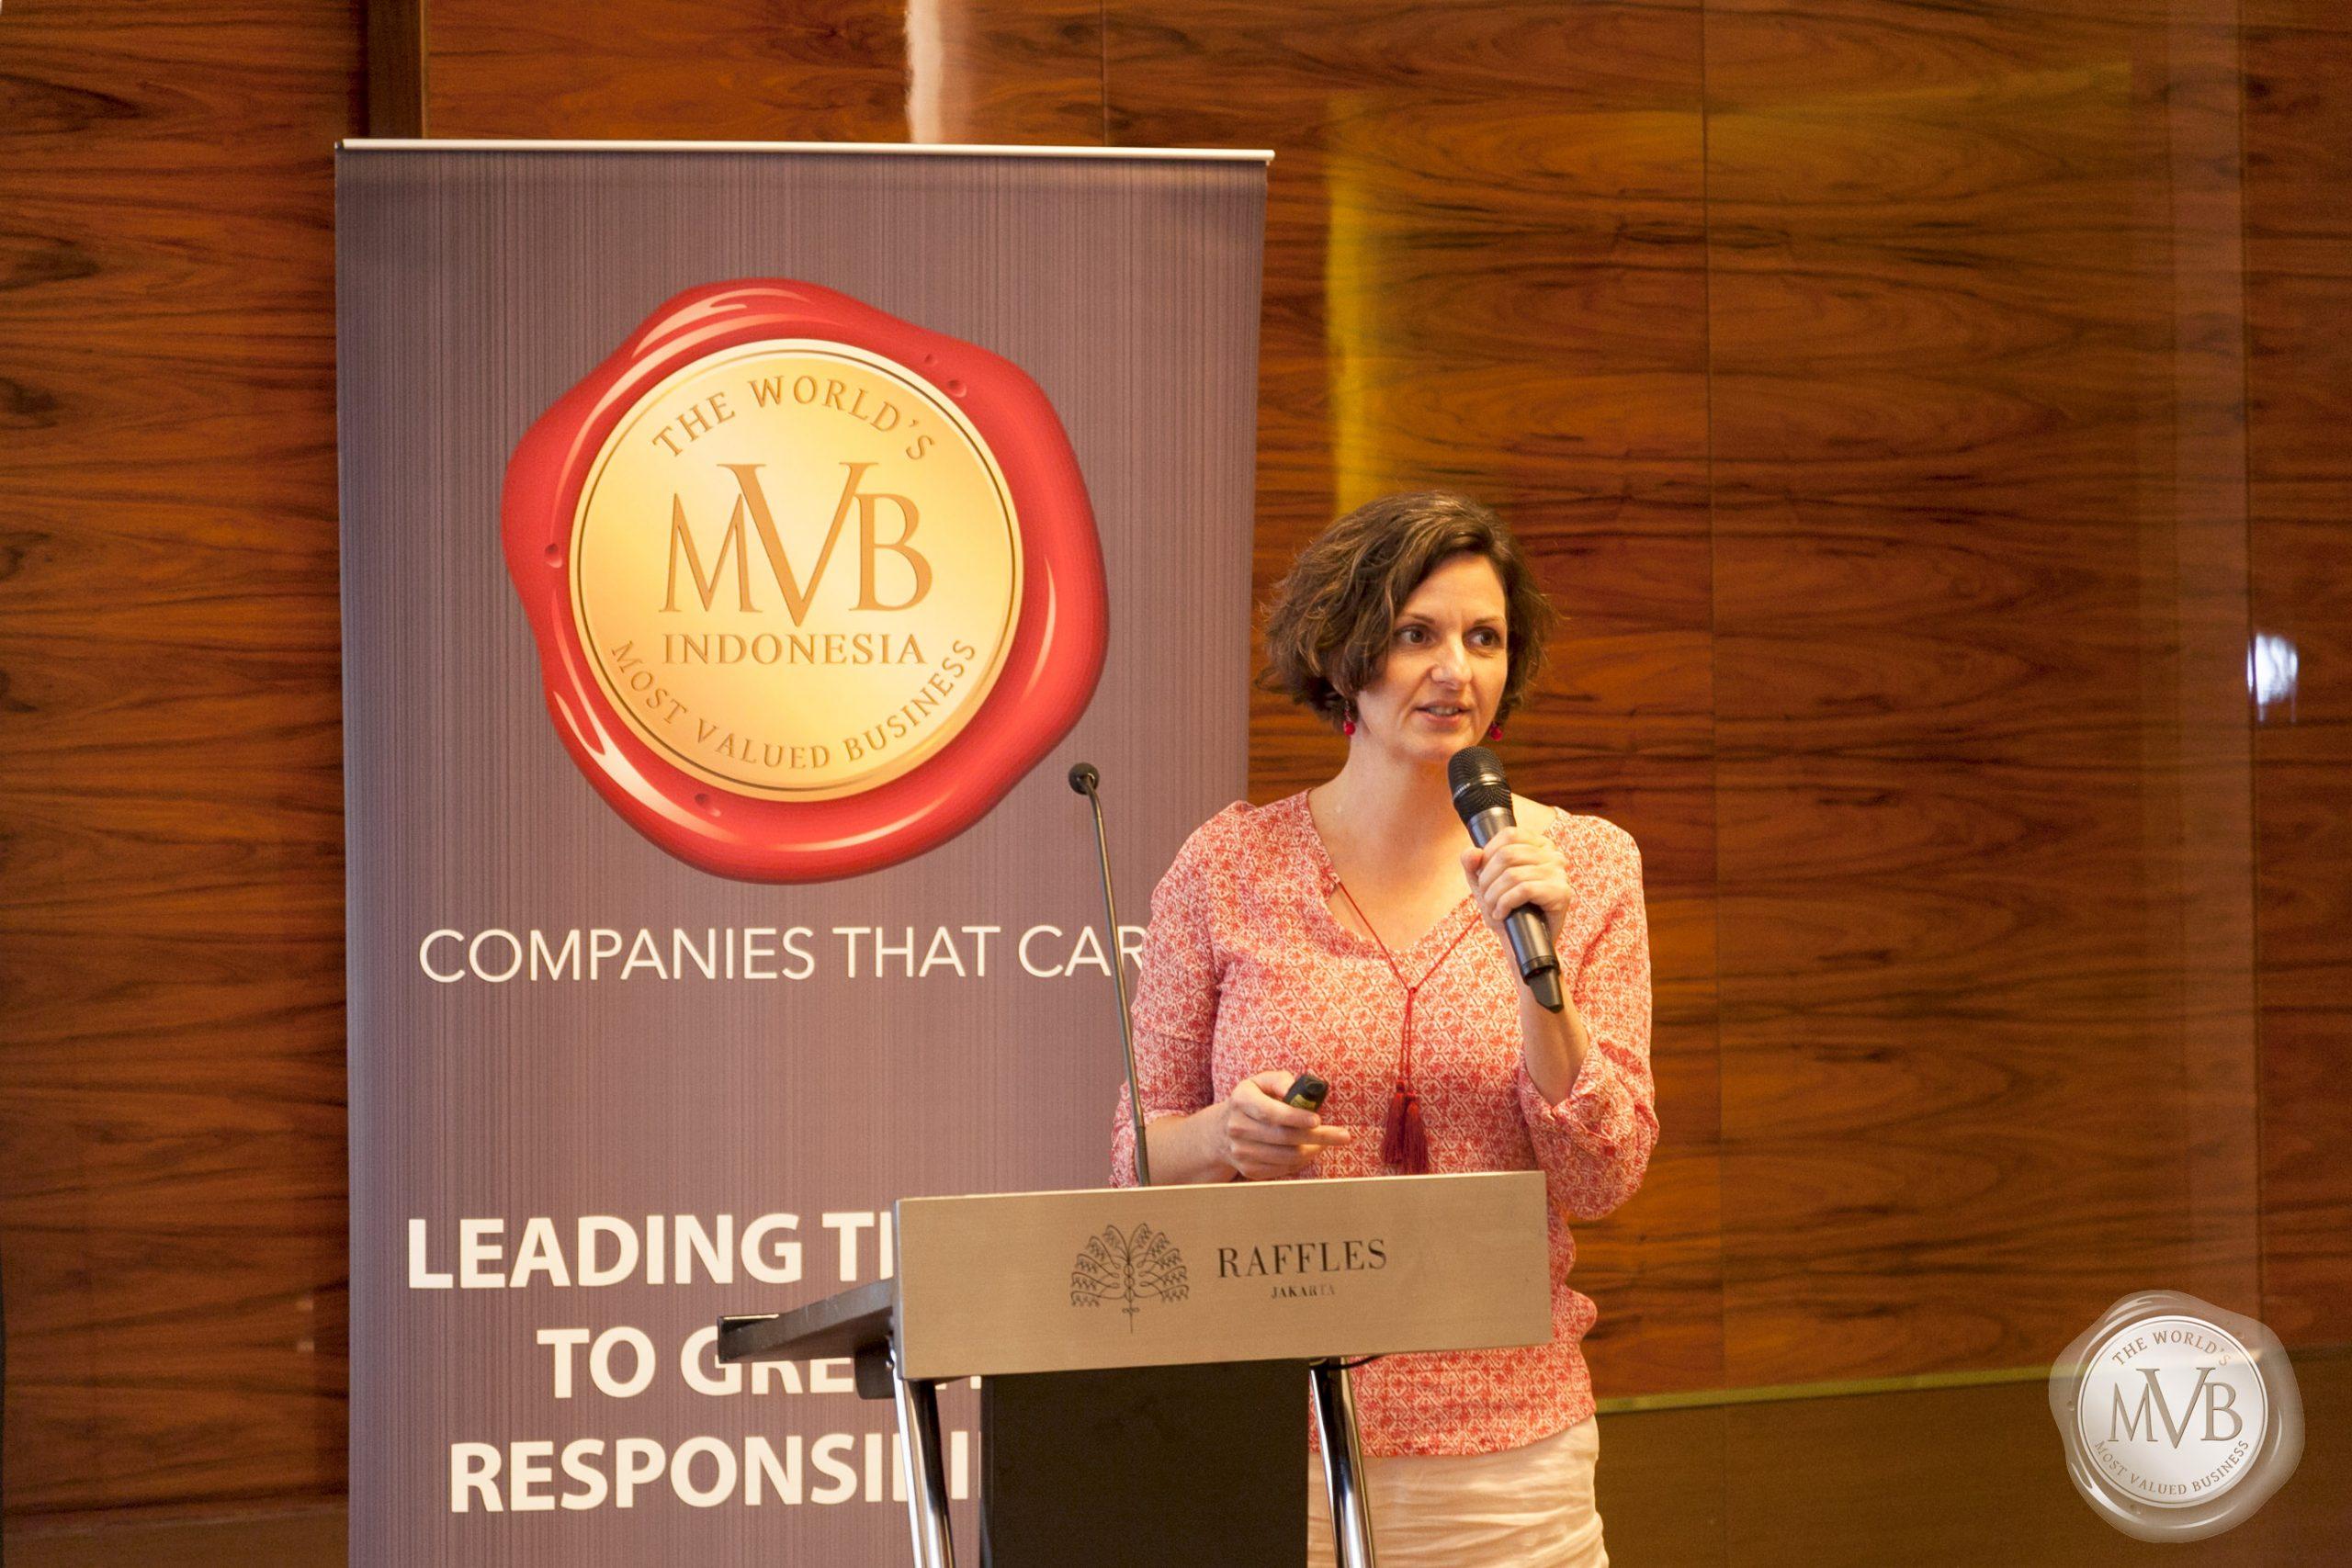 Aug 15, 2018 – MVB Sustainability Seminar